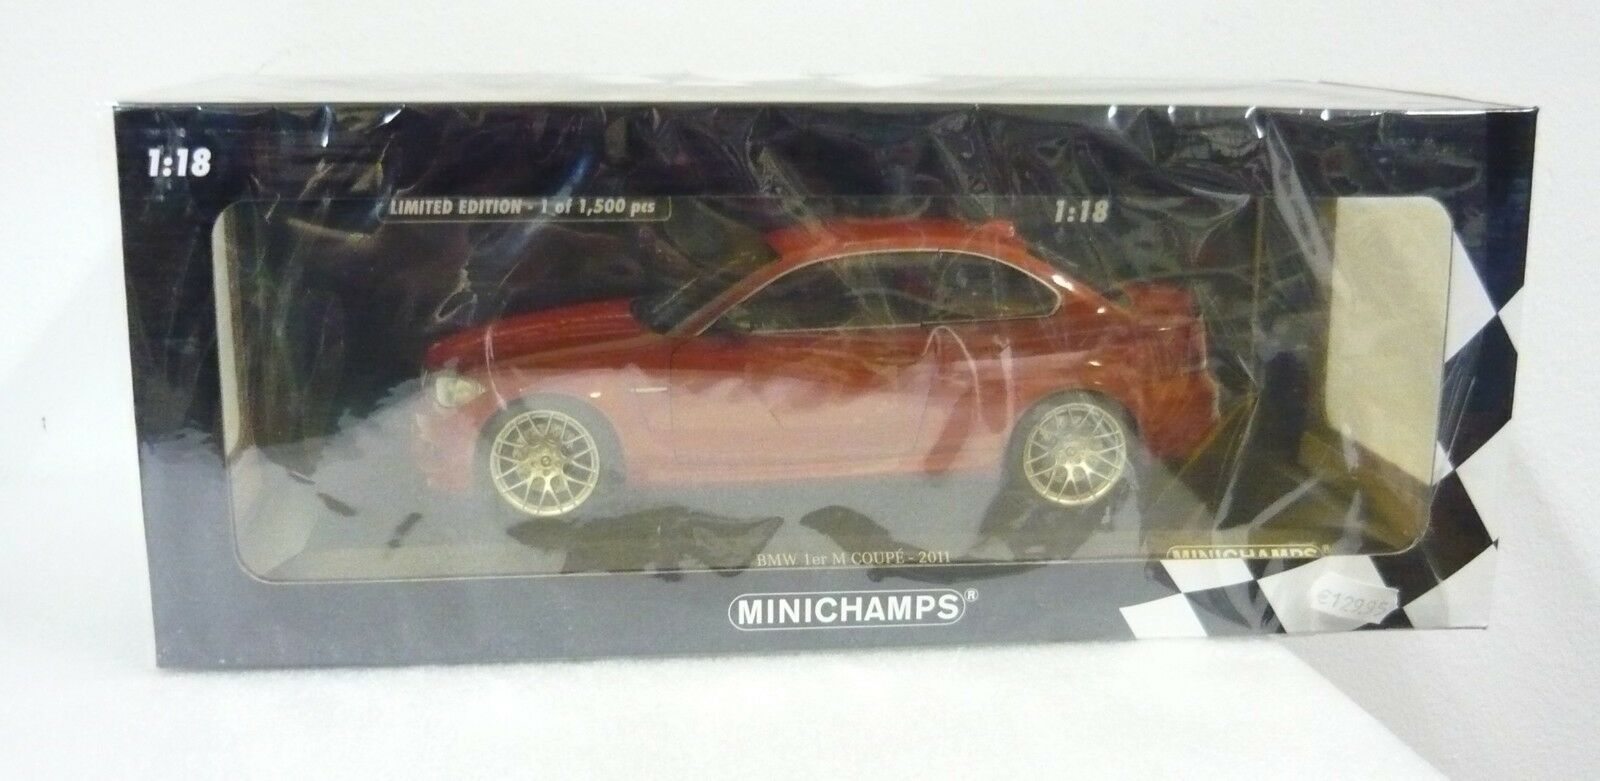 Minichamps 110020020, BMW 1er M Coupé, 2011, arancione metallizzato, 1/18, neu&ovp